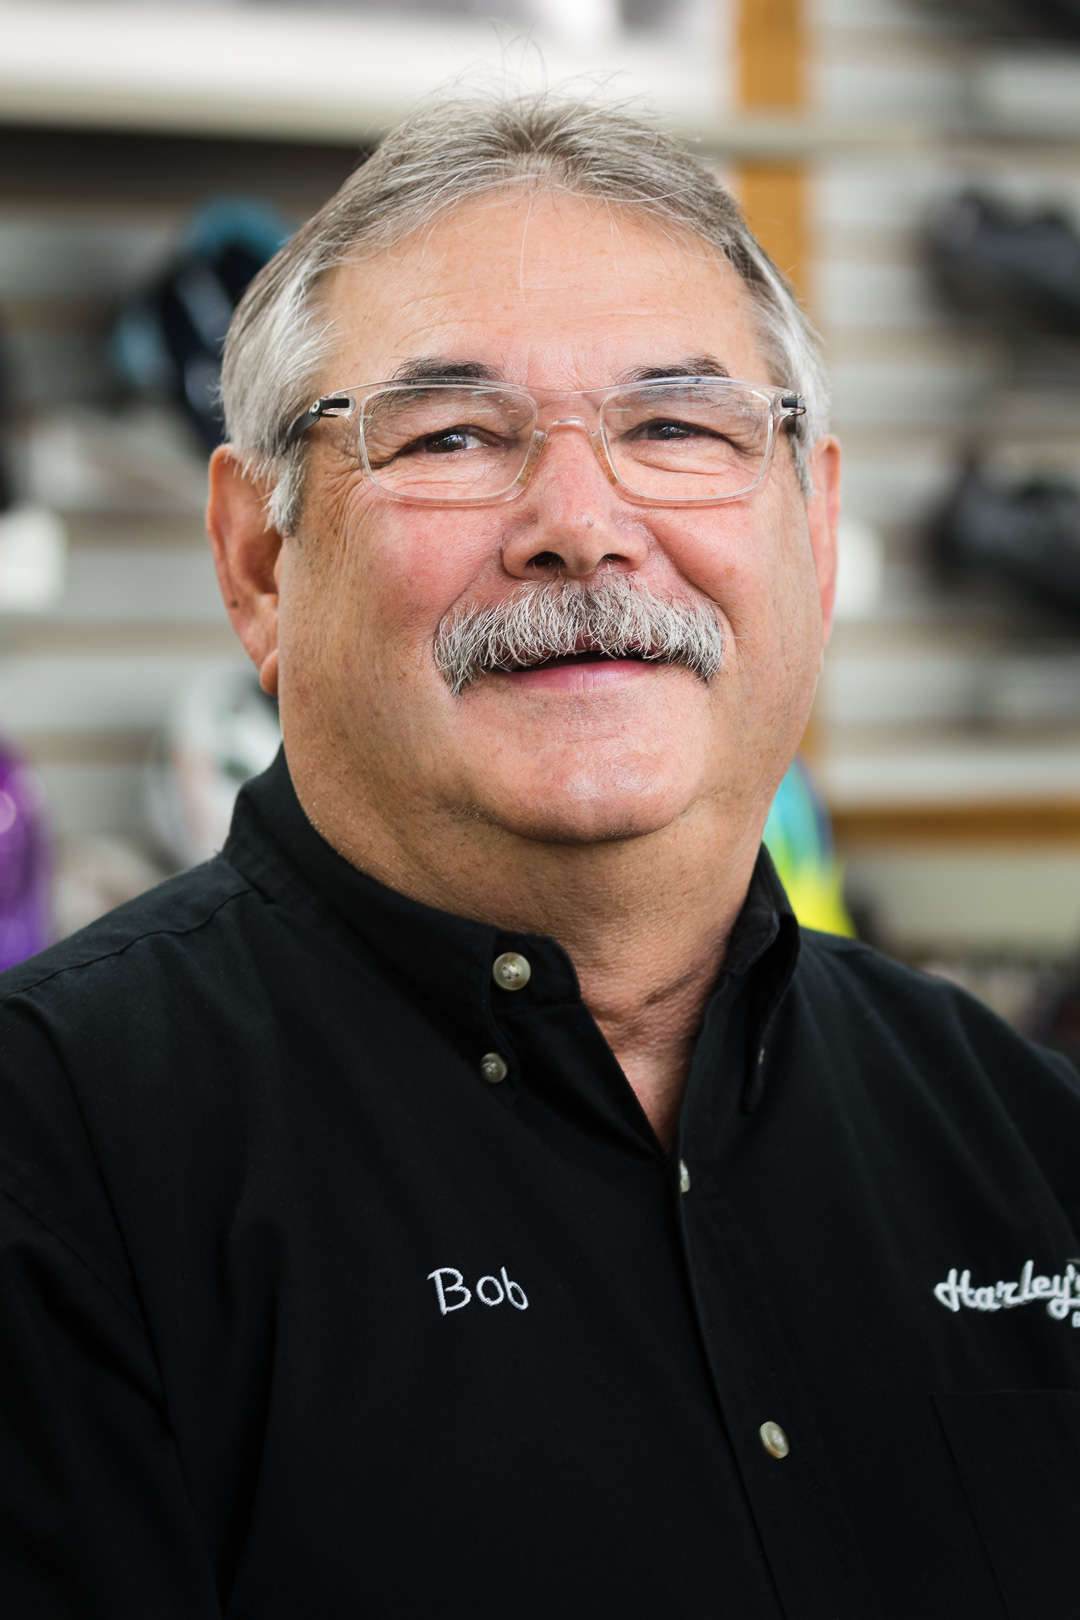 Bob - owner of Harley's